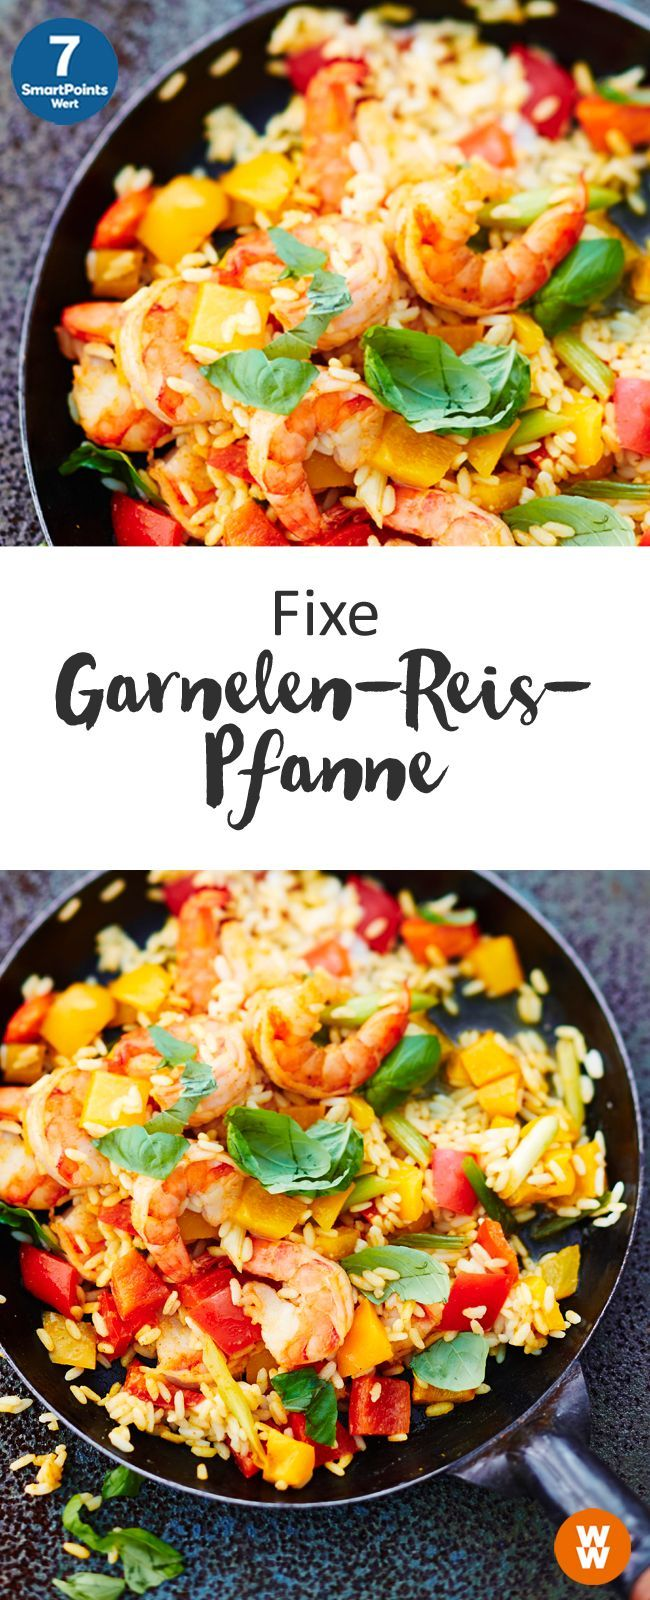 Fixe Garnelen-Reis-Pfanne Fitness fitness weights #fitness #Fixe